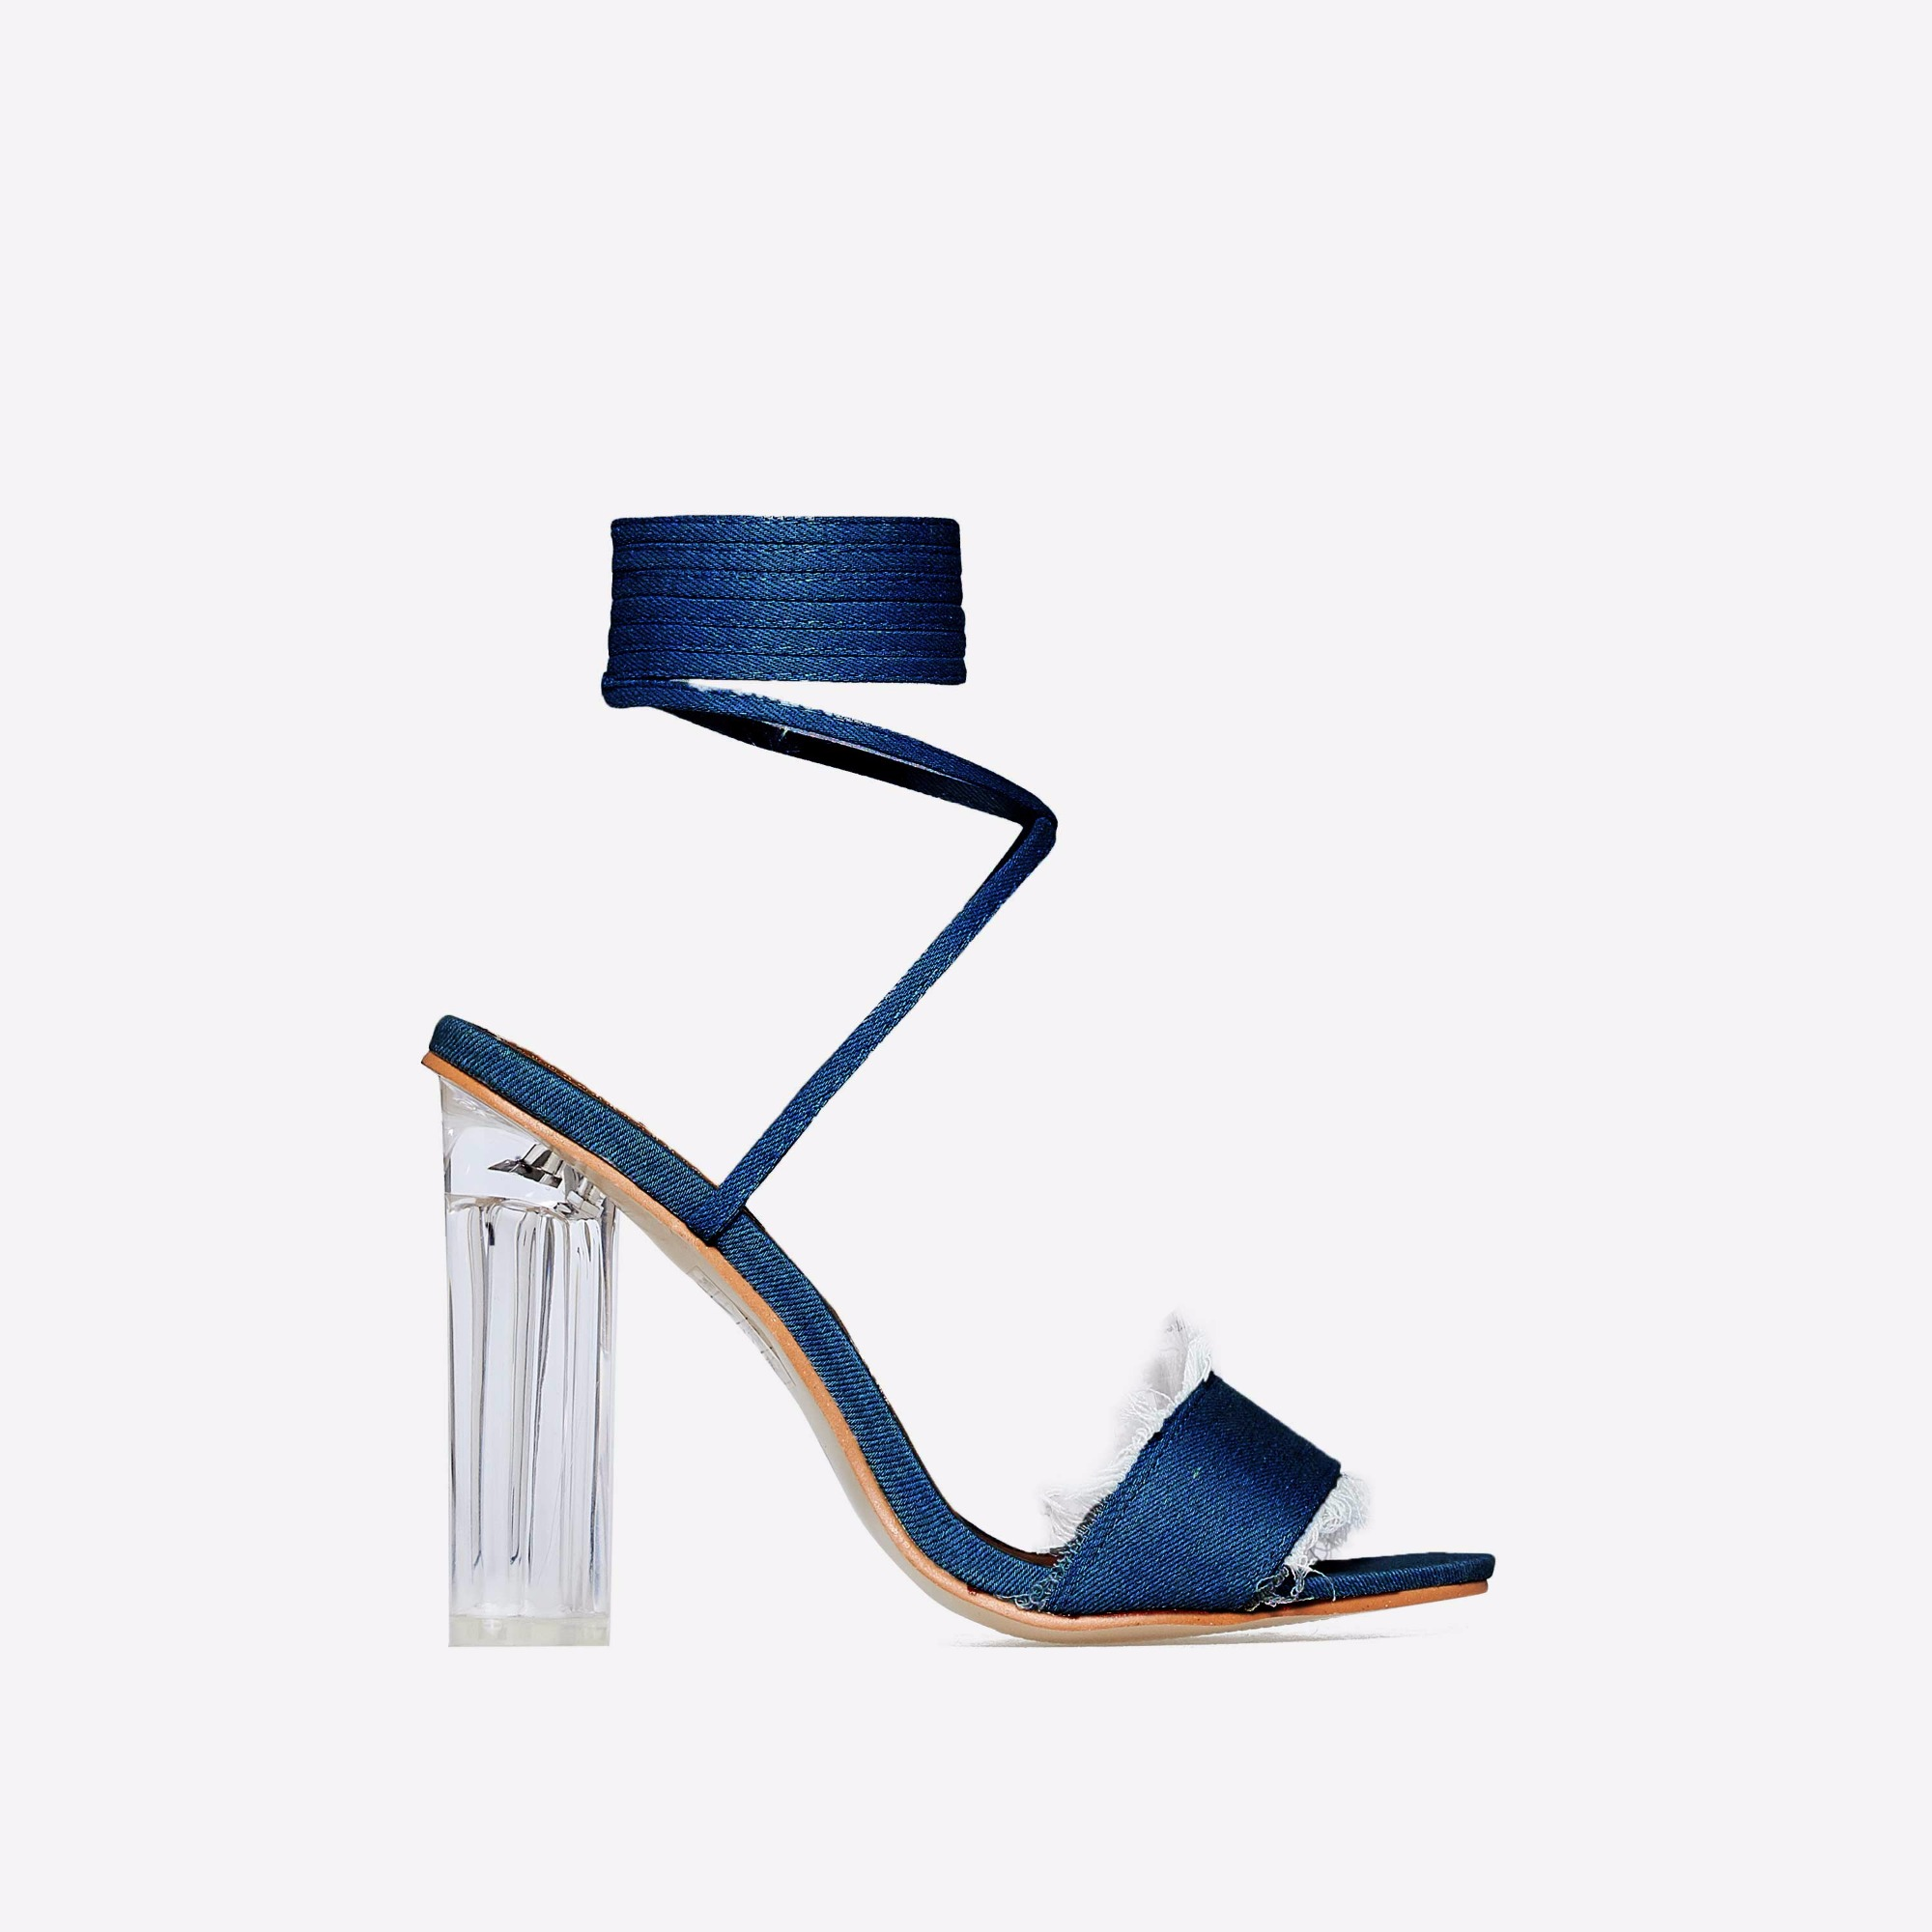 Rhonda Lace Up Perspex Heel In Dark Blue Denim